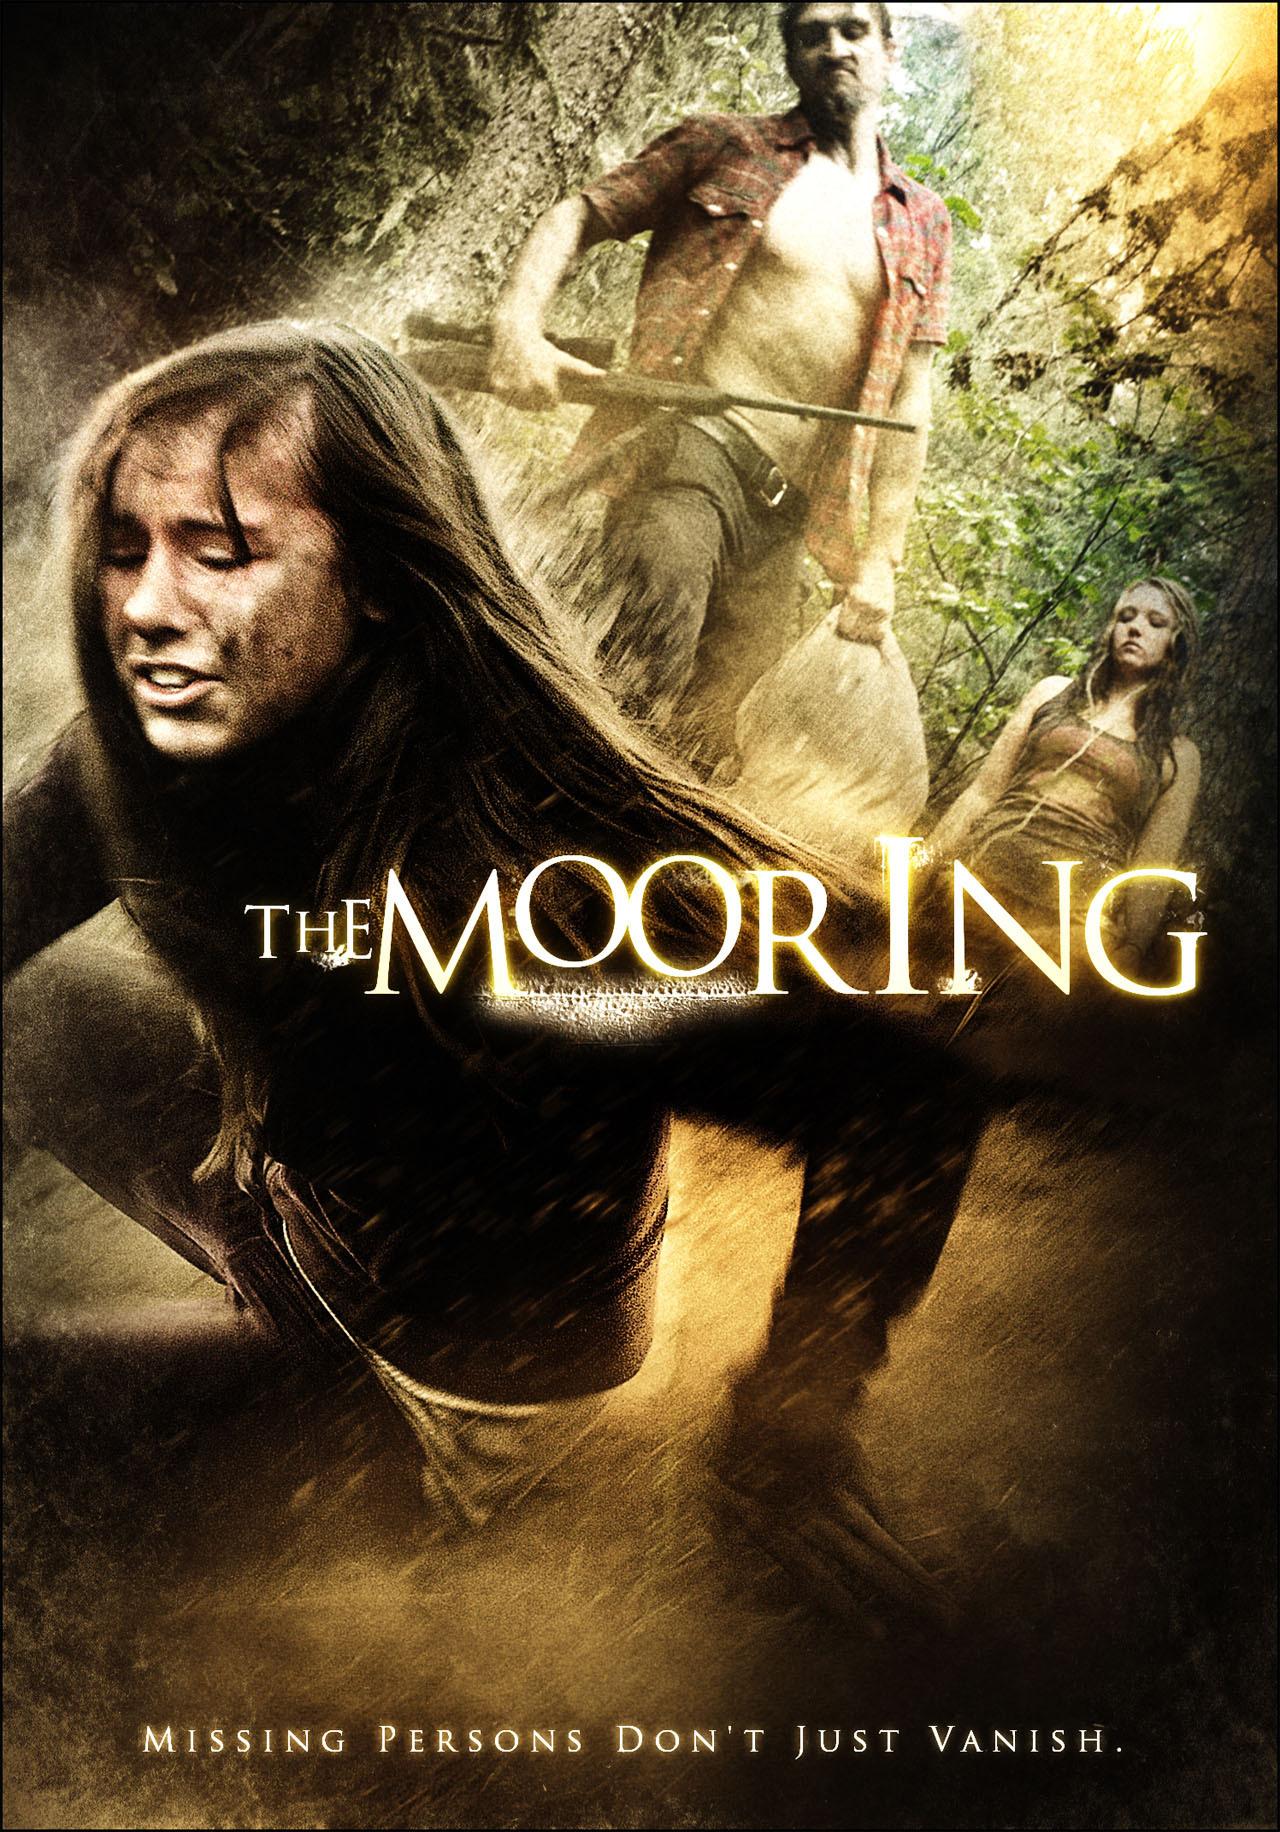 دانلود زیرنویس فارسی فیلم The Mooring